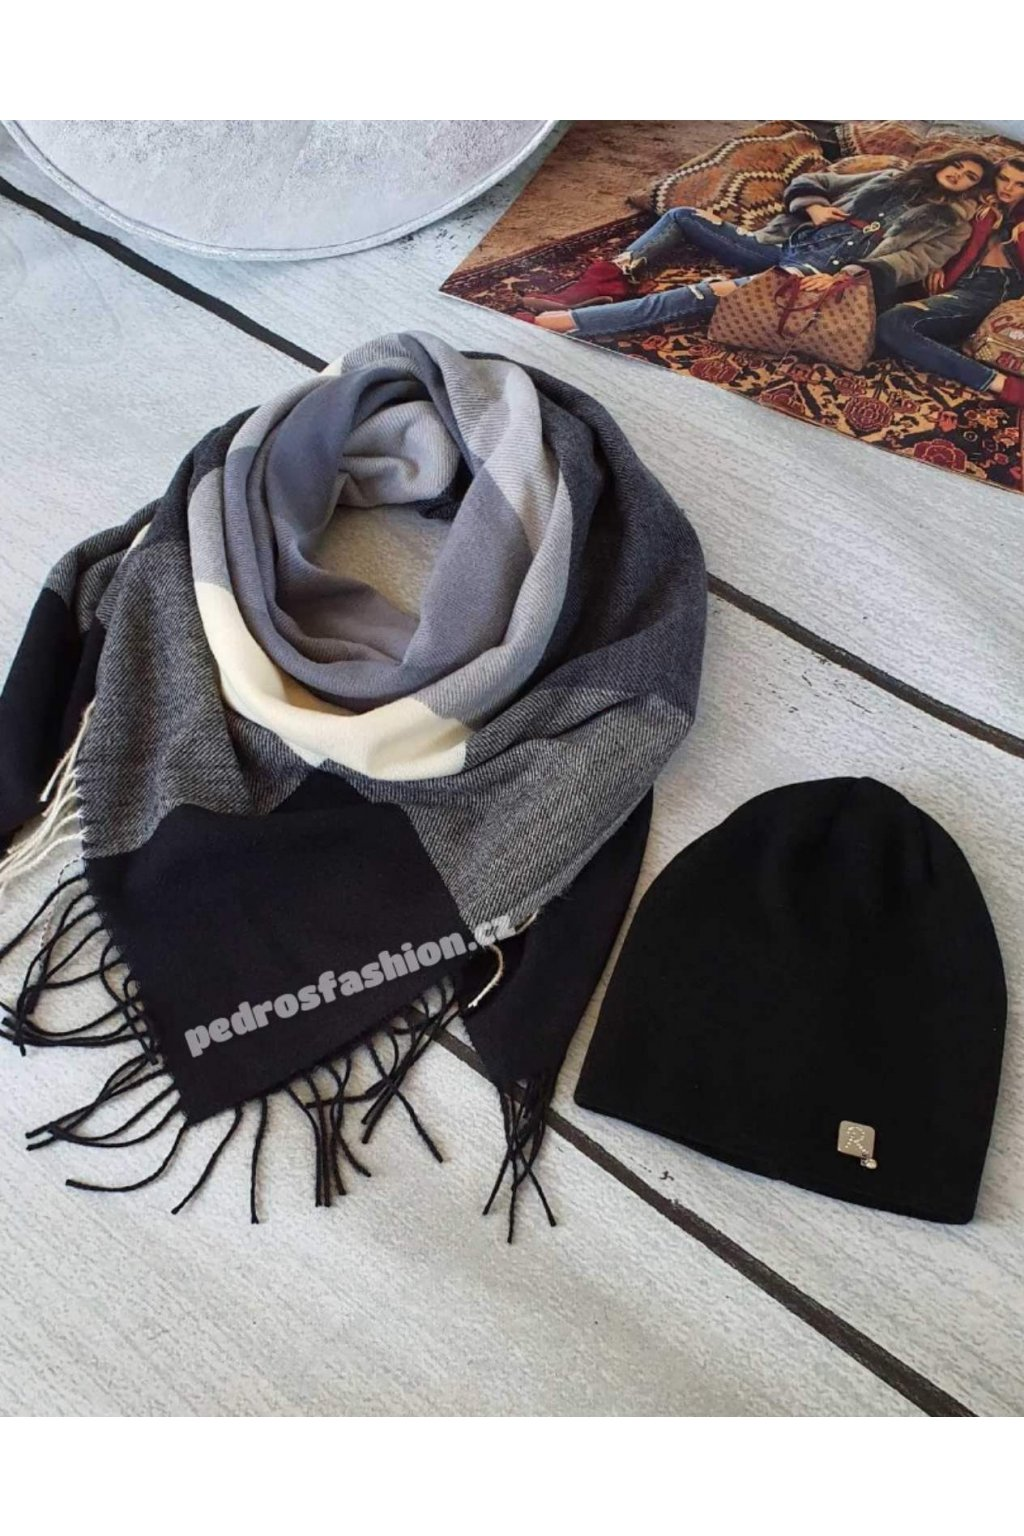 Sladný set čepice a šátku v kombinaci černé, šedé a krémové barvy.